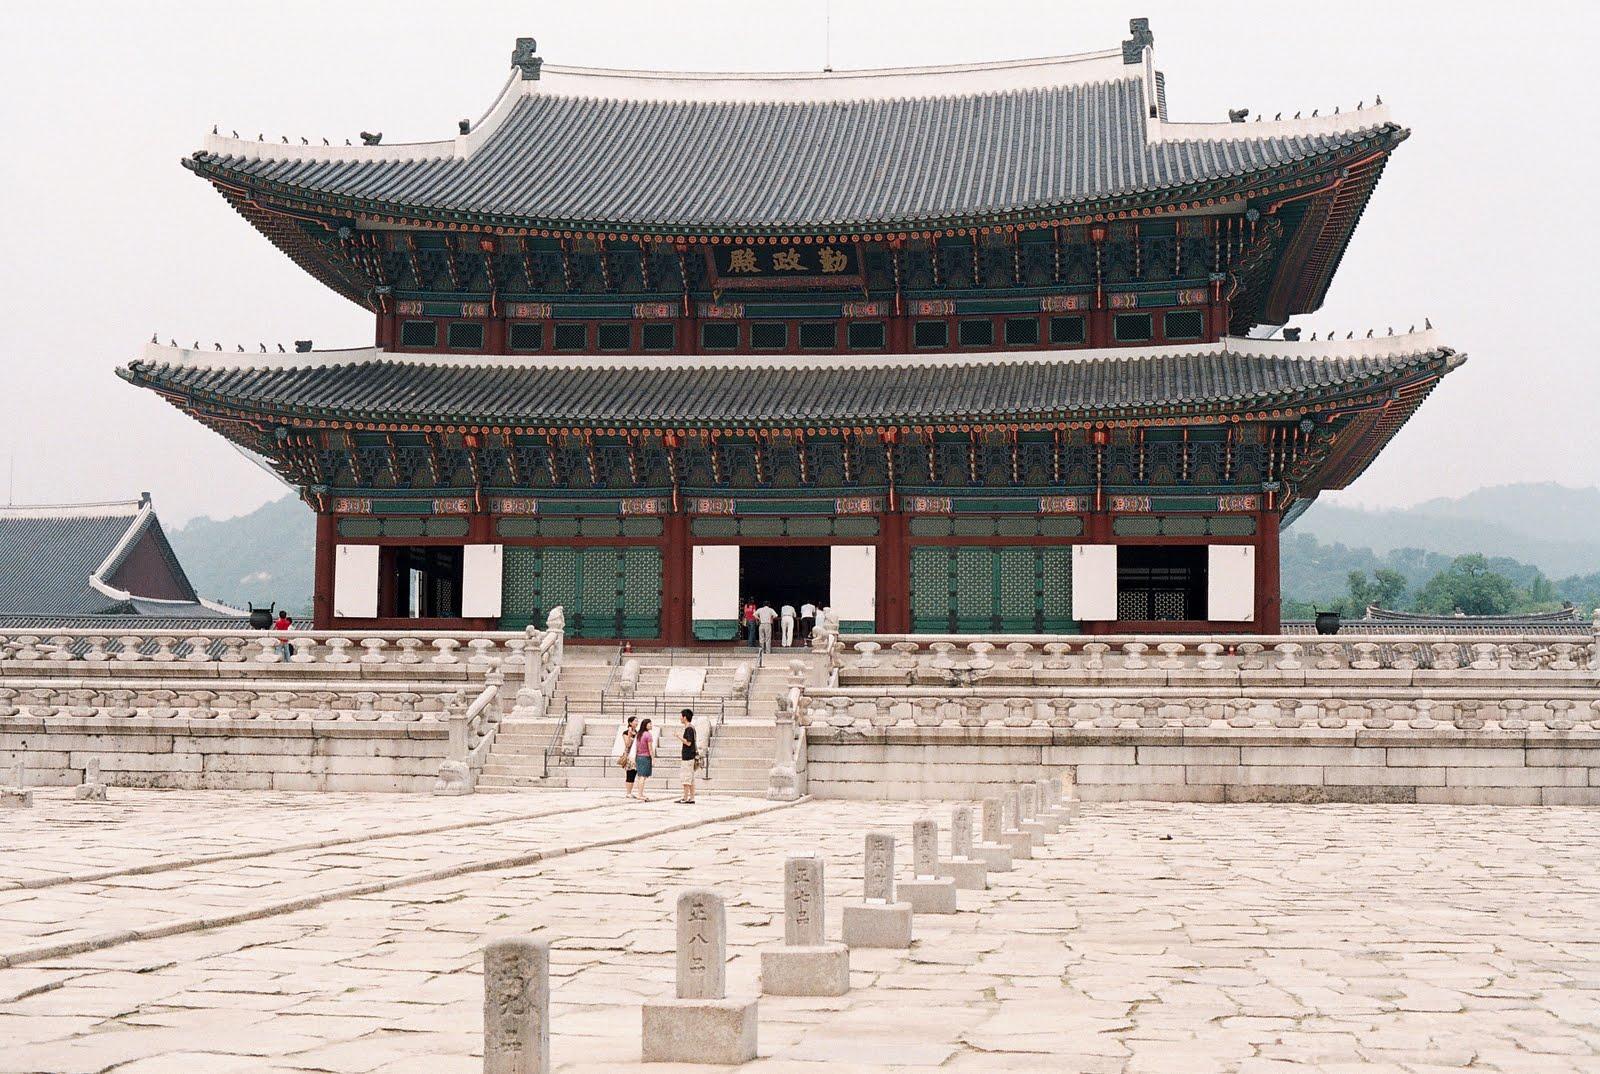 TEMPAT WISATA DI KOREA SELATAN  LANATRI DANIRMALA